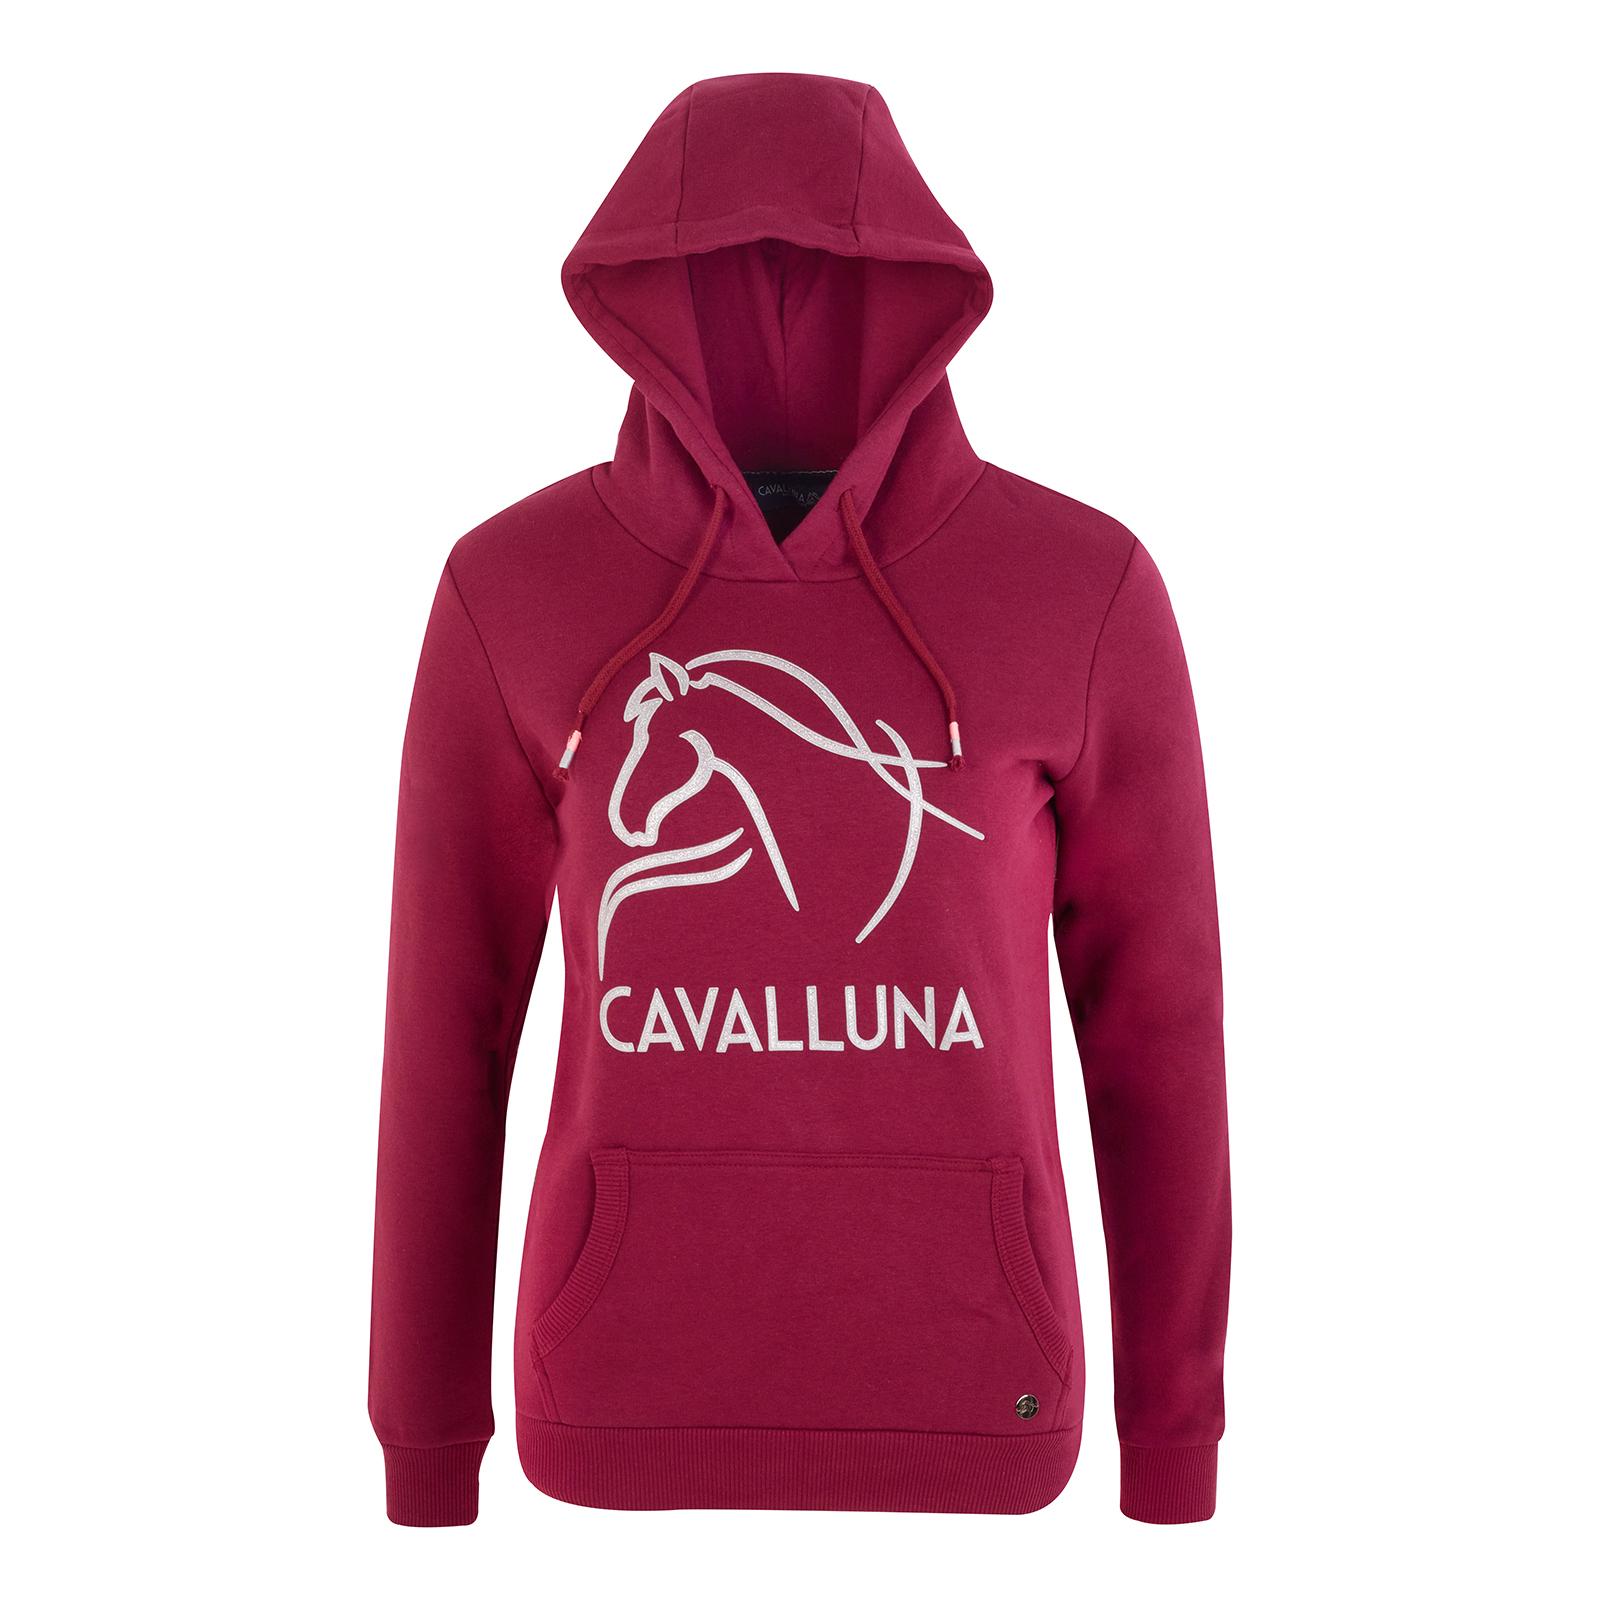 Cavalluna-Hoody-rot